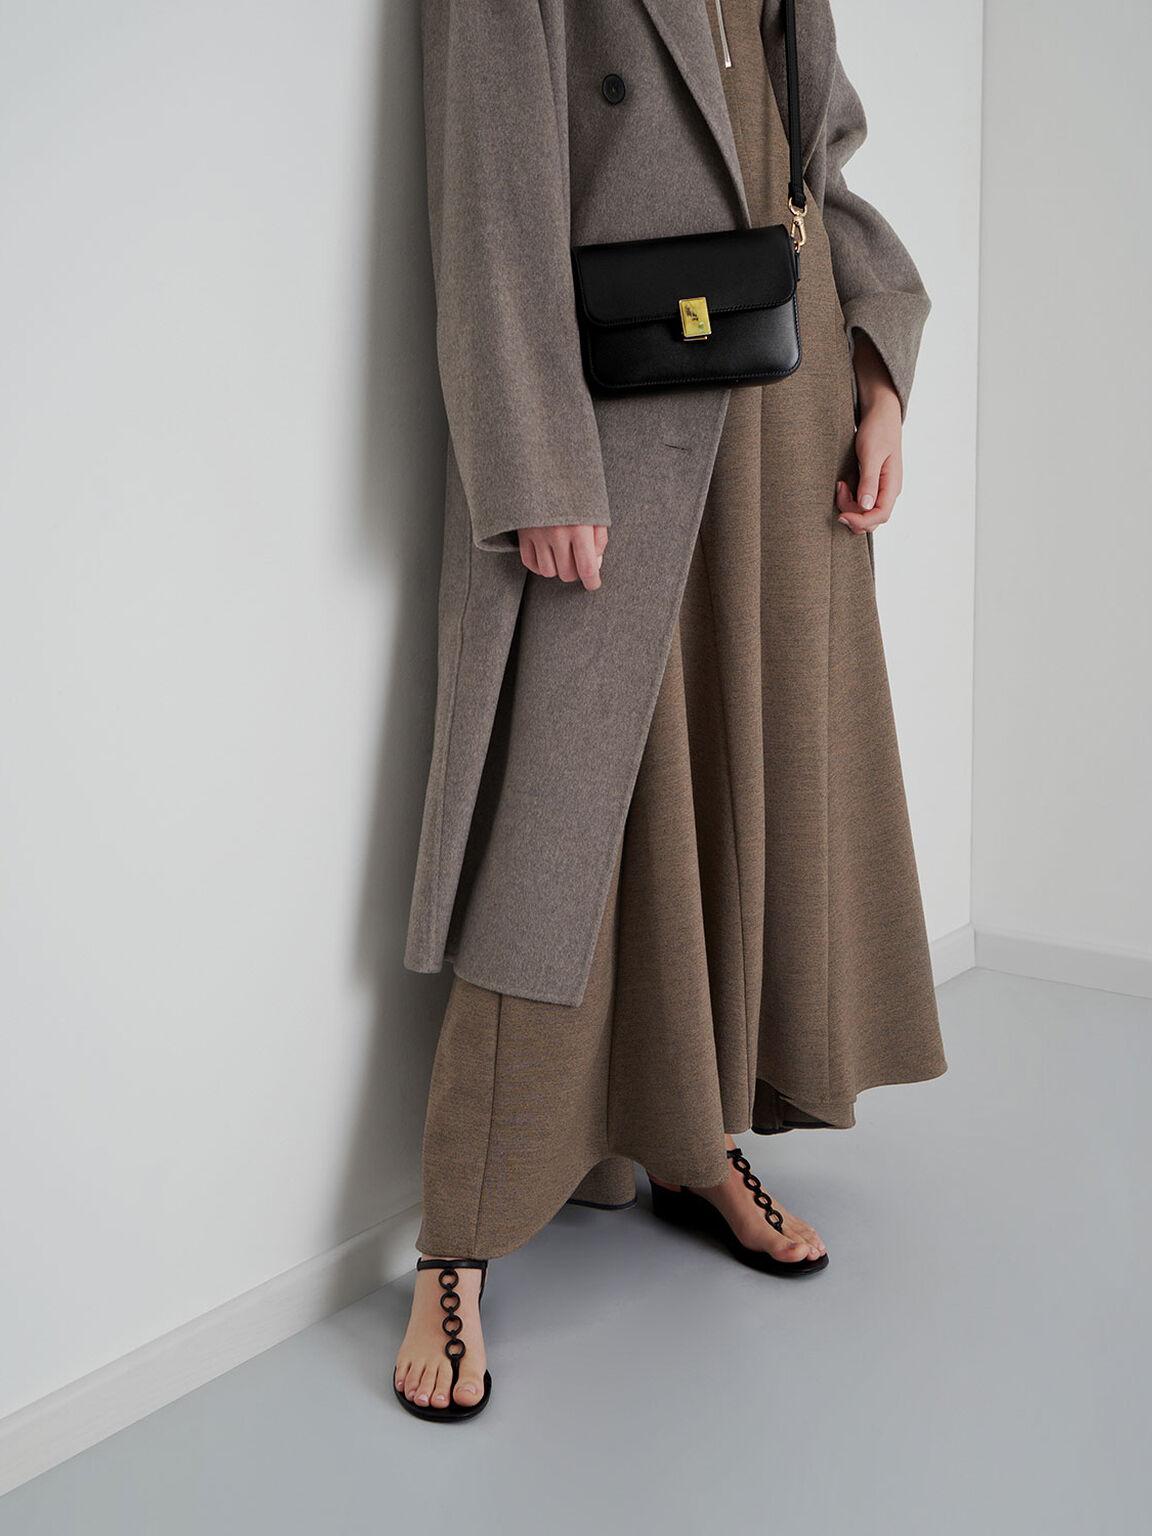 Leather Embellished Push-Lock Crossbody Bag, Black, hi-res